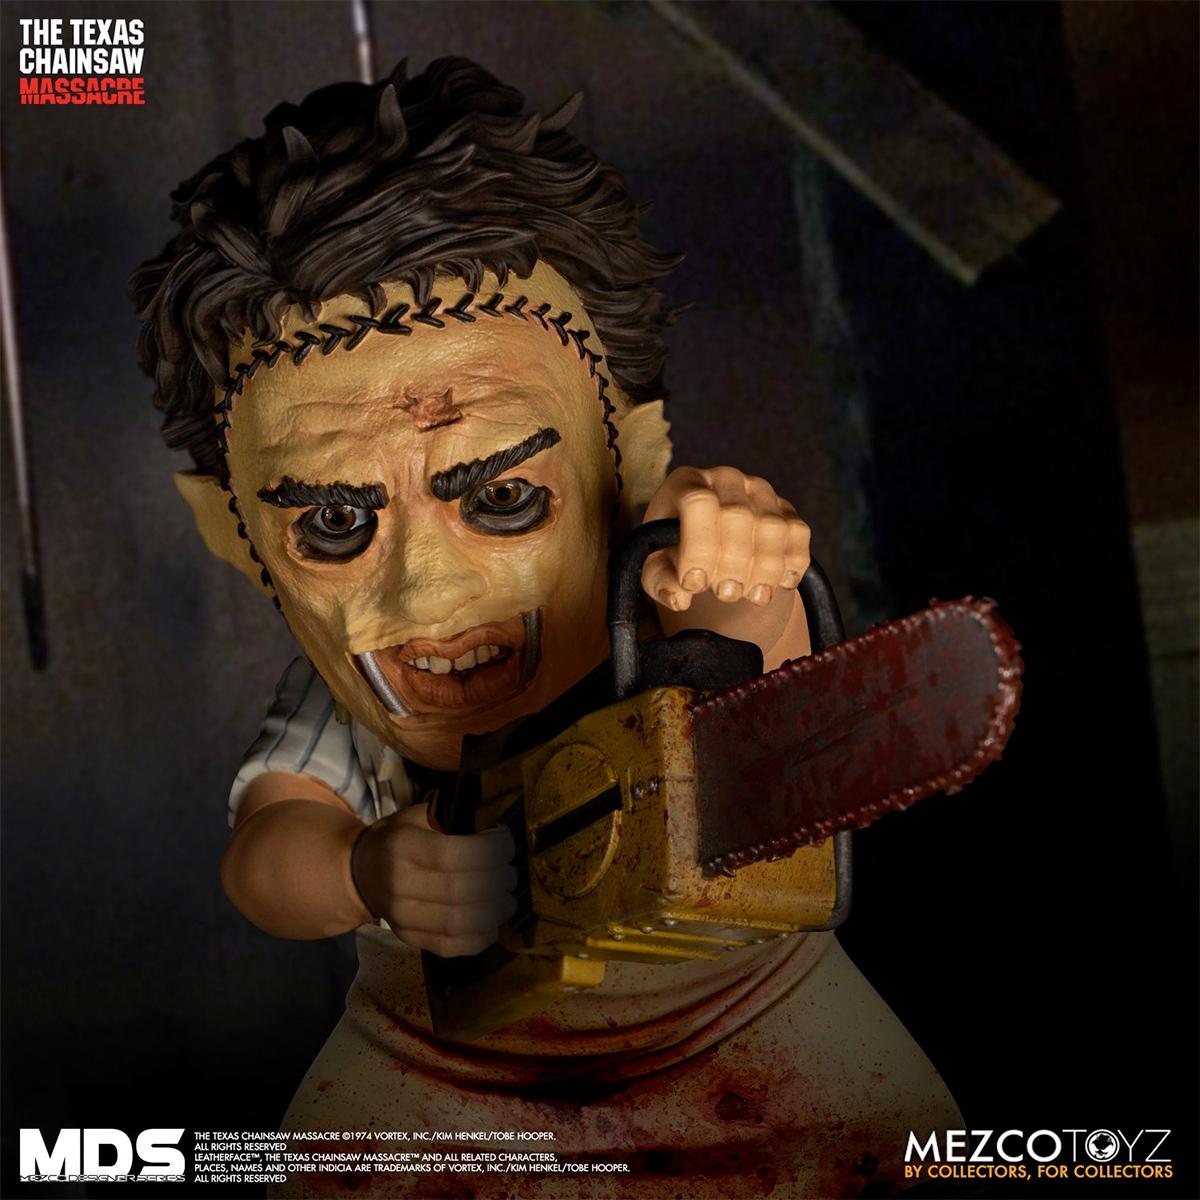 Boneco Texas Chainsaw Massacre (1974): Leatherface Mezco Designer Series